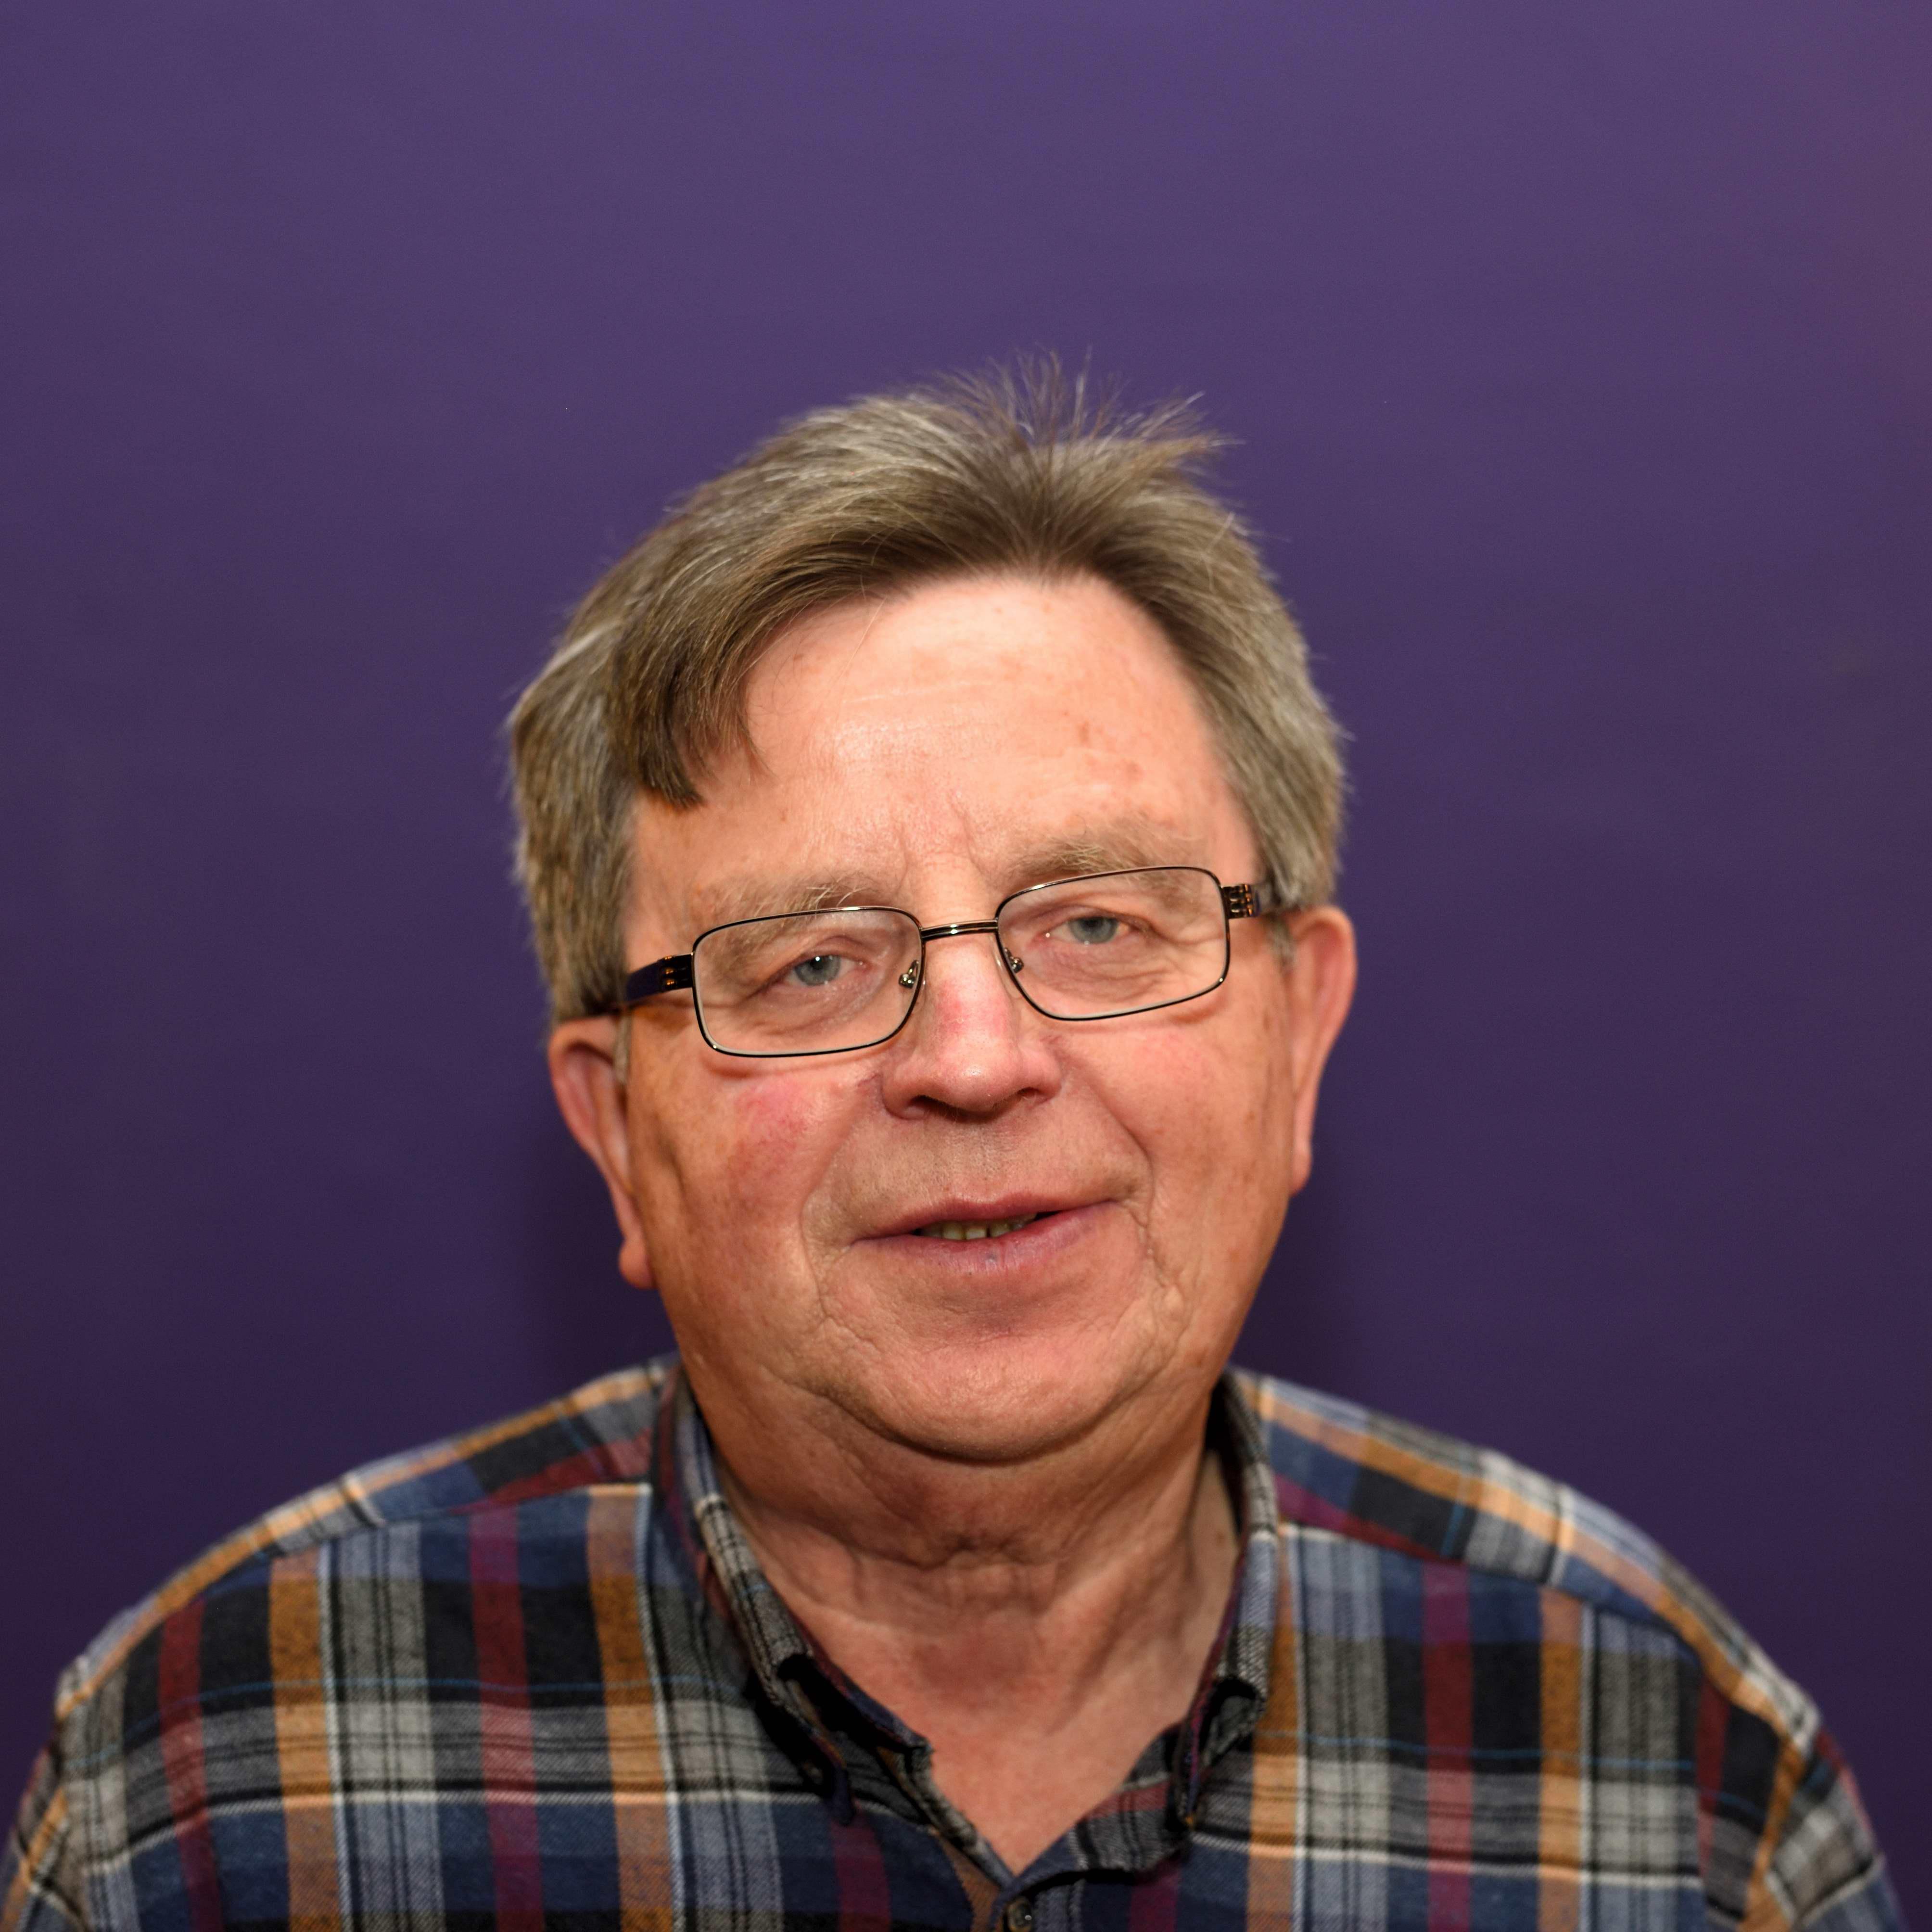 Willi Hemann